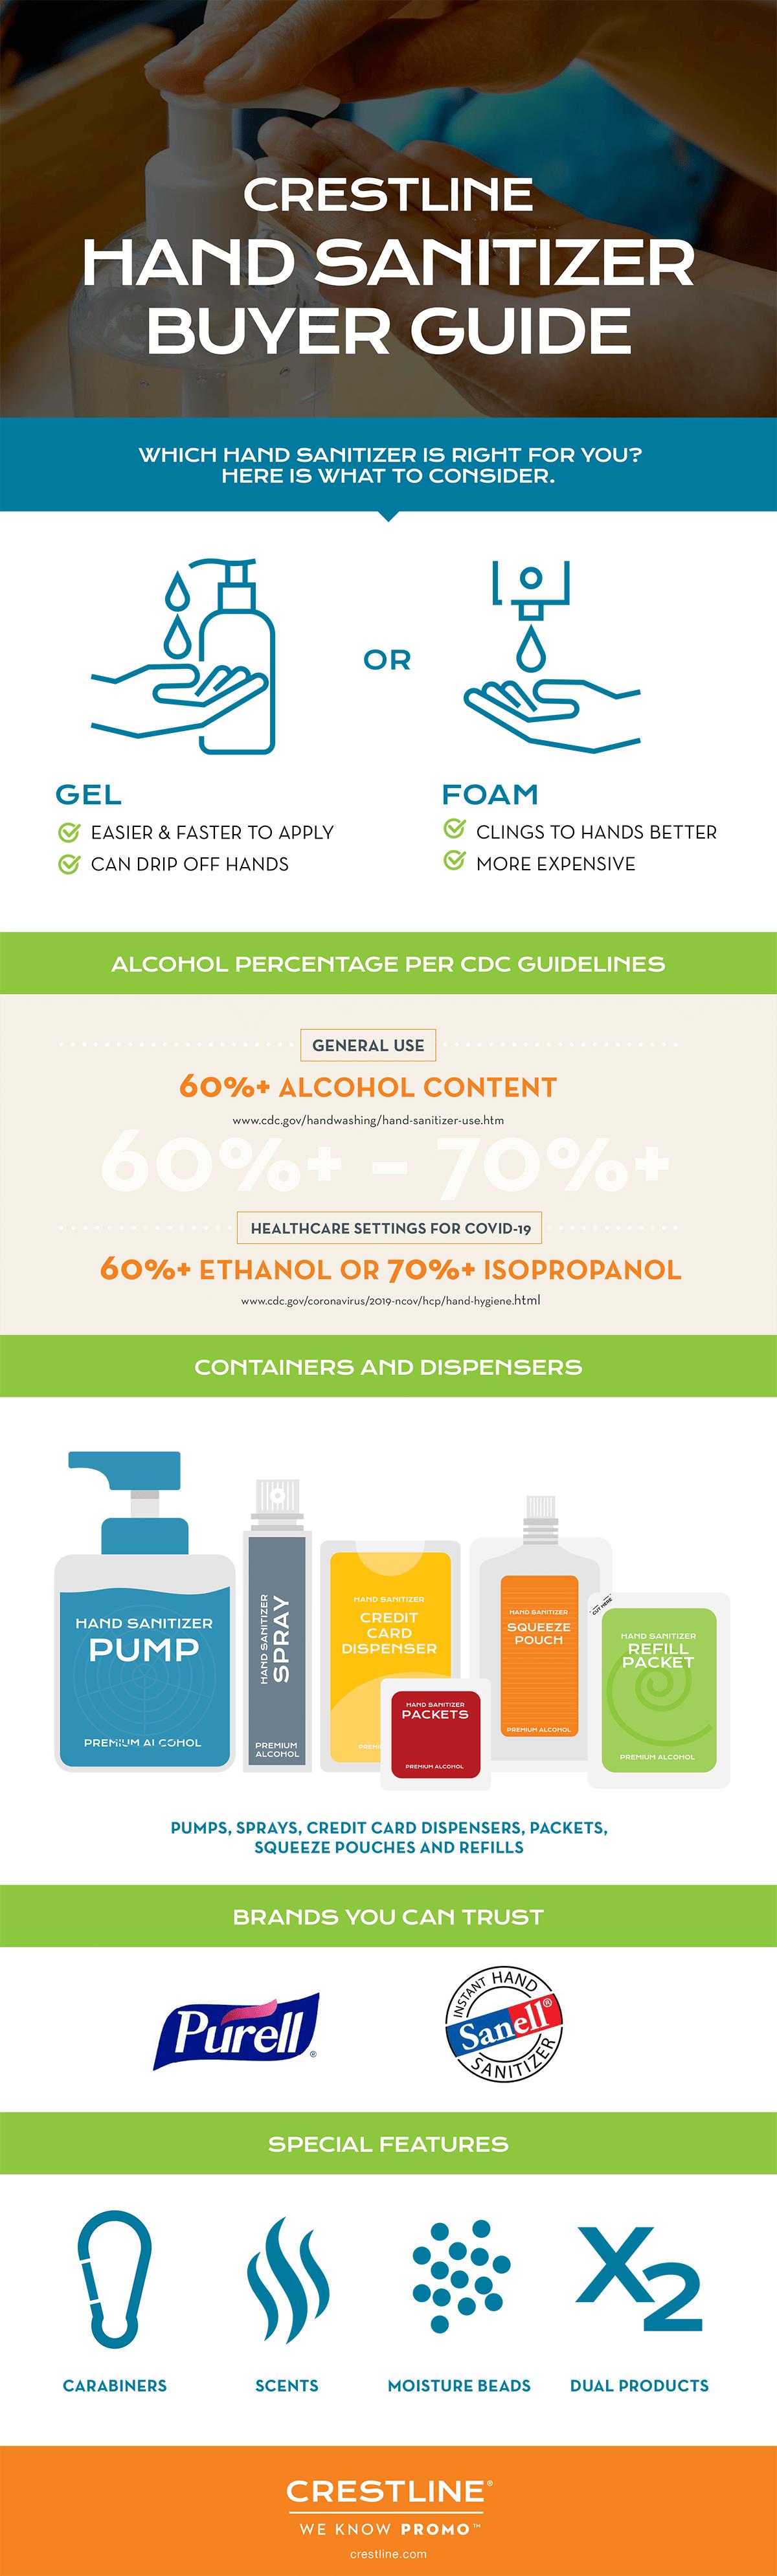 Custom hand sanitizers infographic